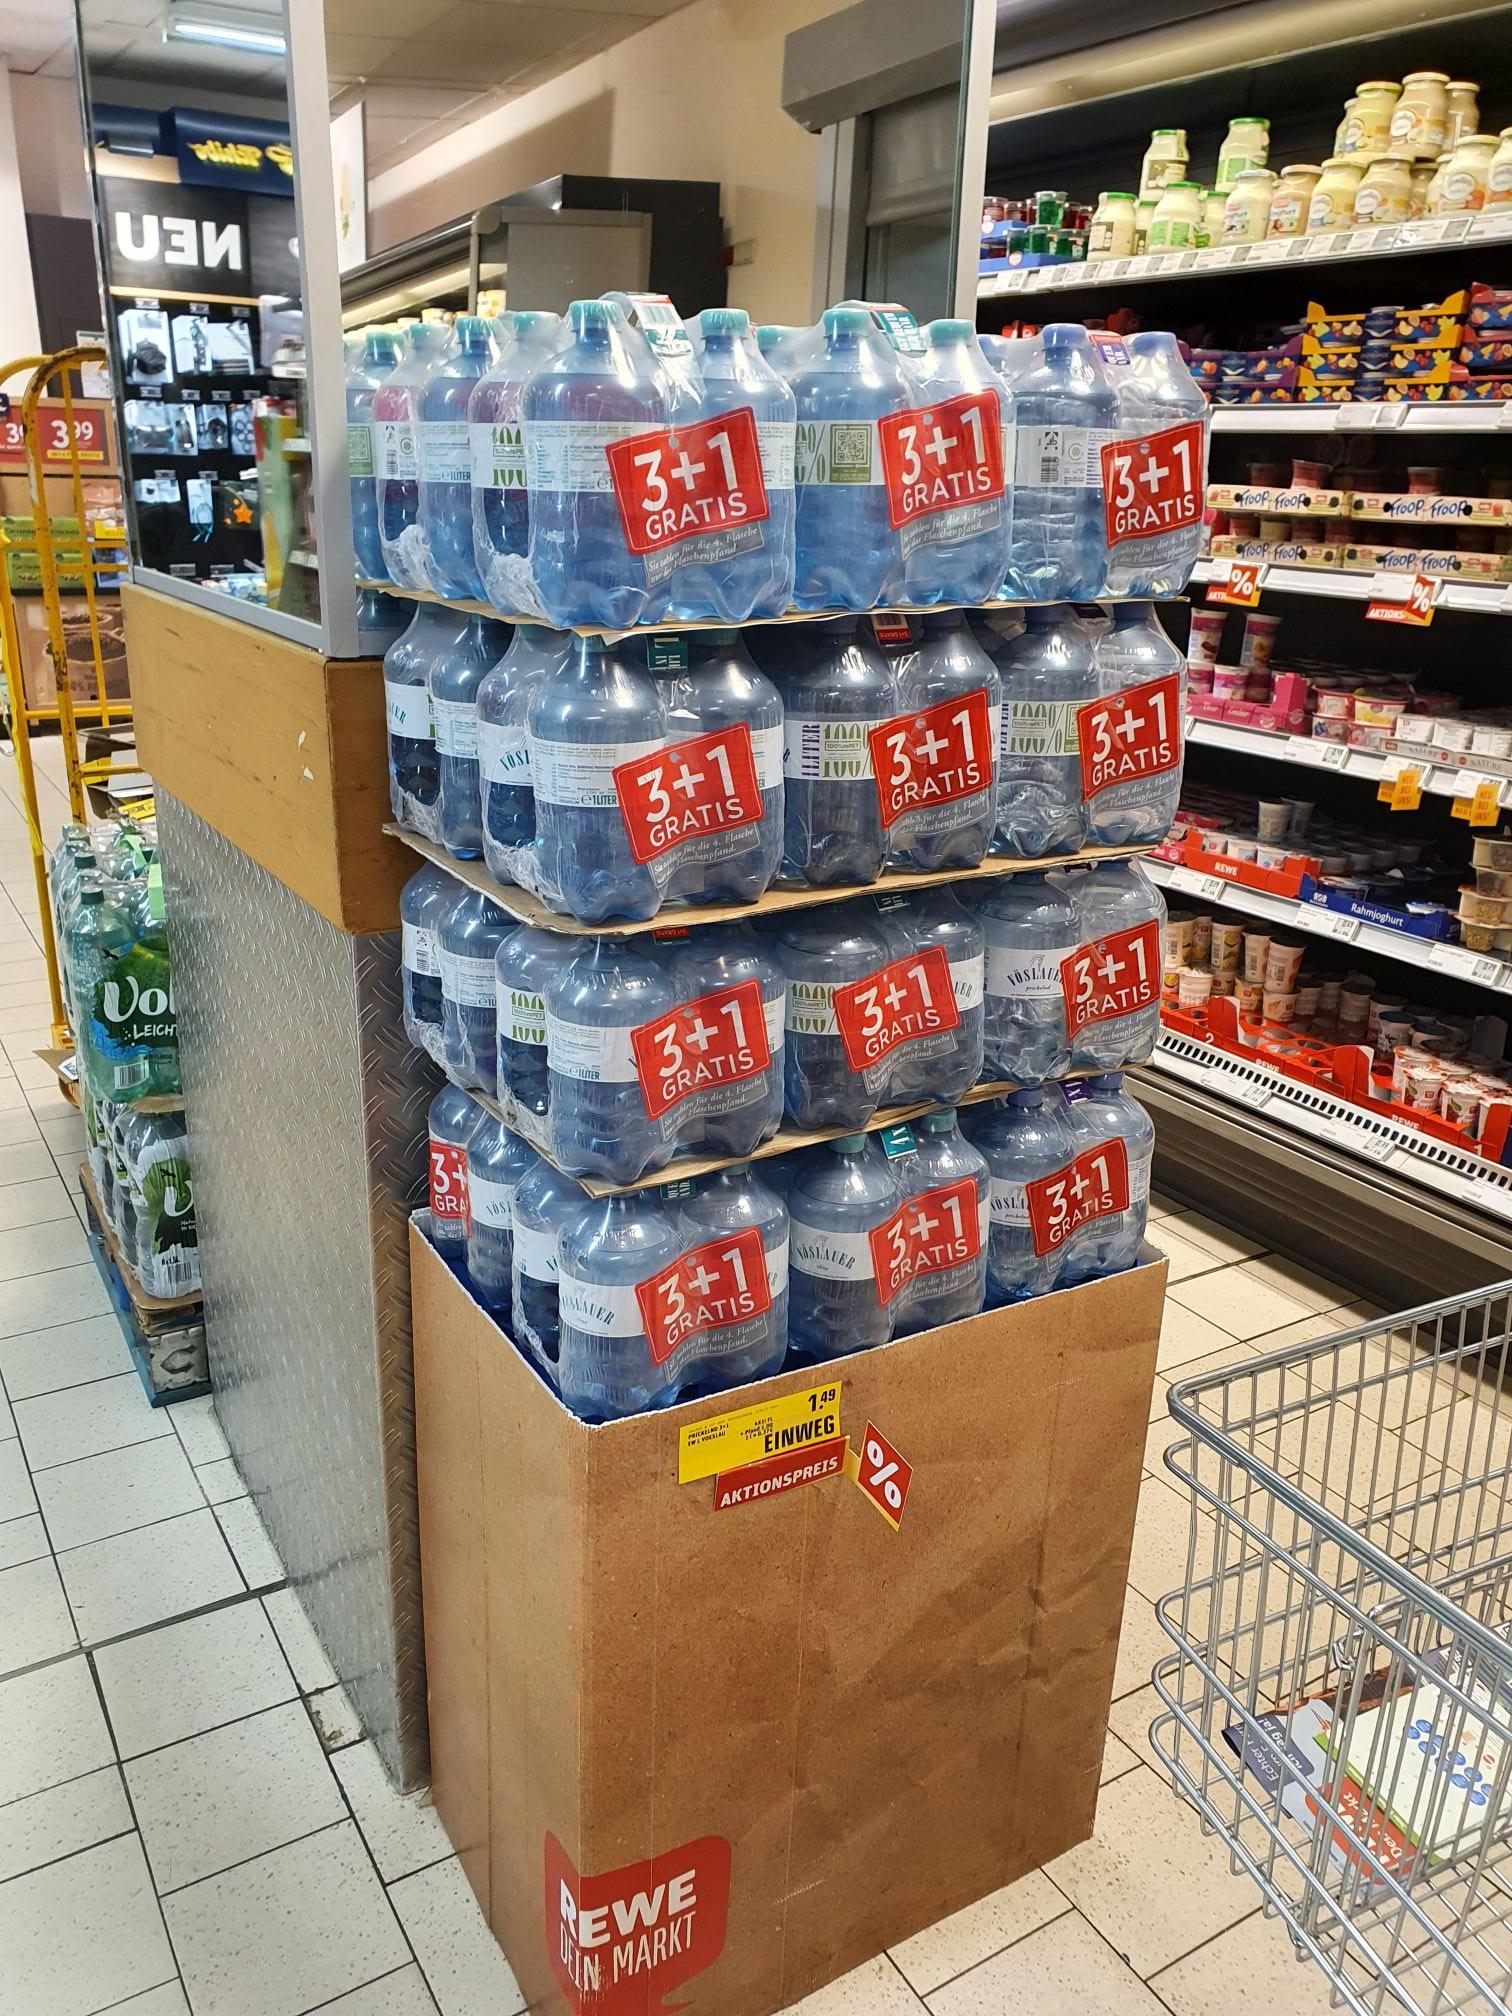 (Lpz Hbf,Holzhausen | Göttingen) VÖSLAUER 3 Flaschen + 1 Flasche Gratis (zzgl. 1€ Pfand) Rewe